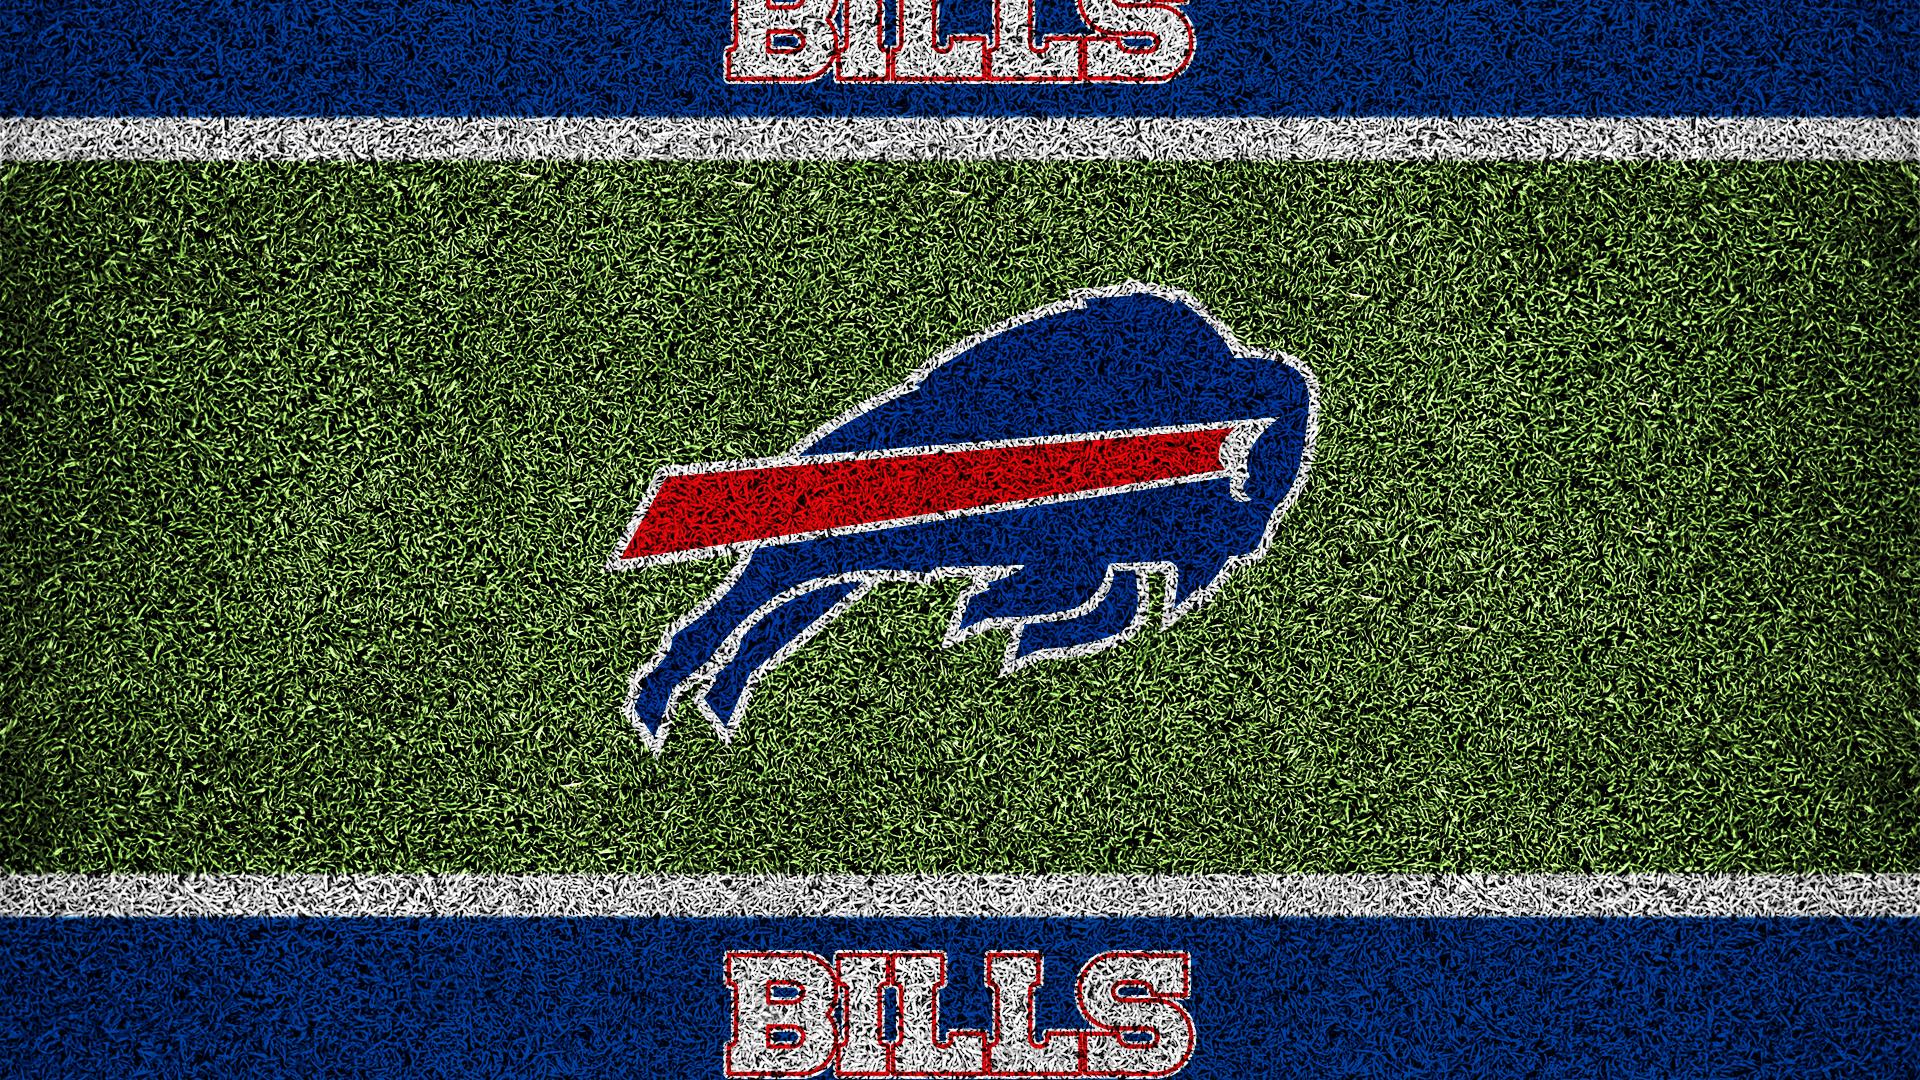 Buffalo Bills Logo wallpaper   901354 1920x1080